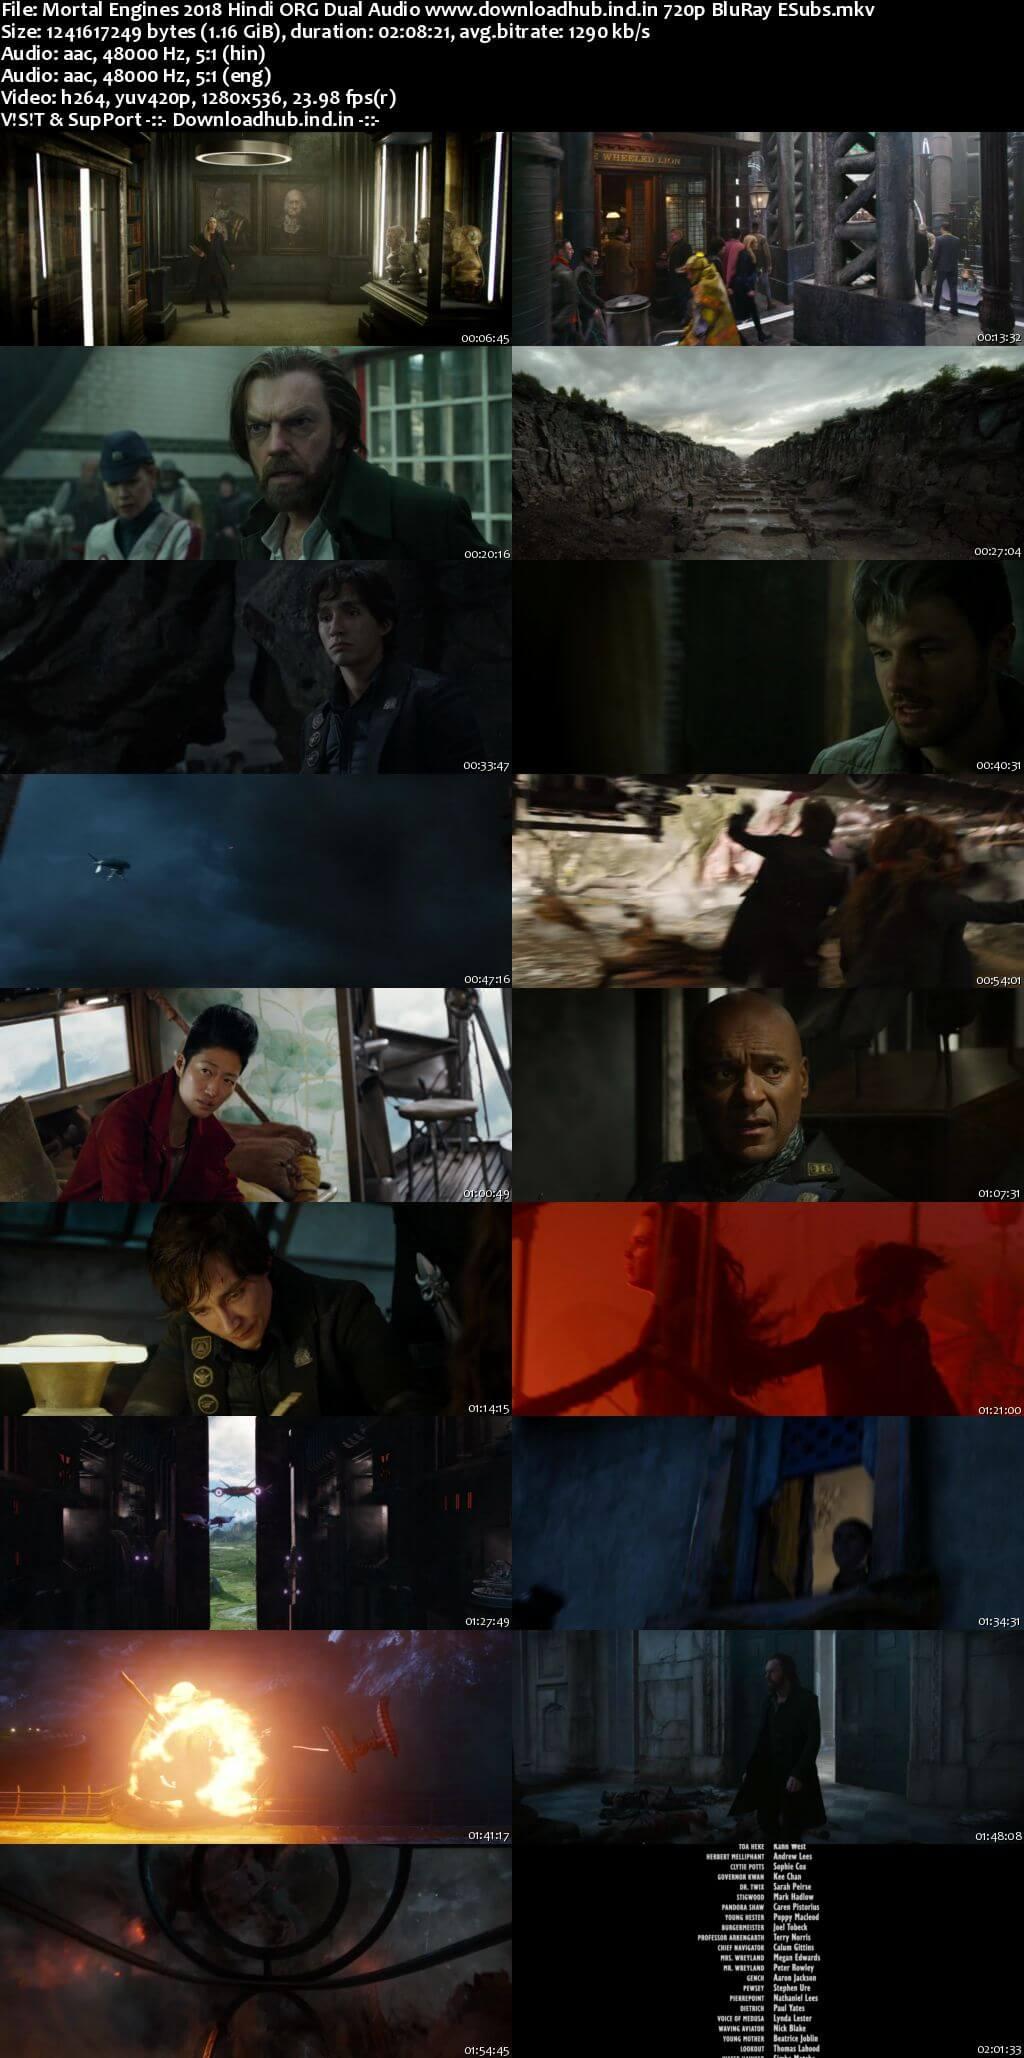 Mortal Engines 2018 Hindi ORG Dual Audio 720p BluRay ESubs